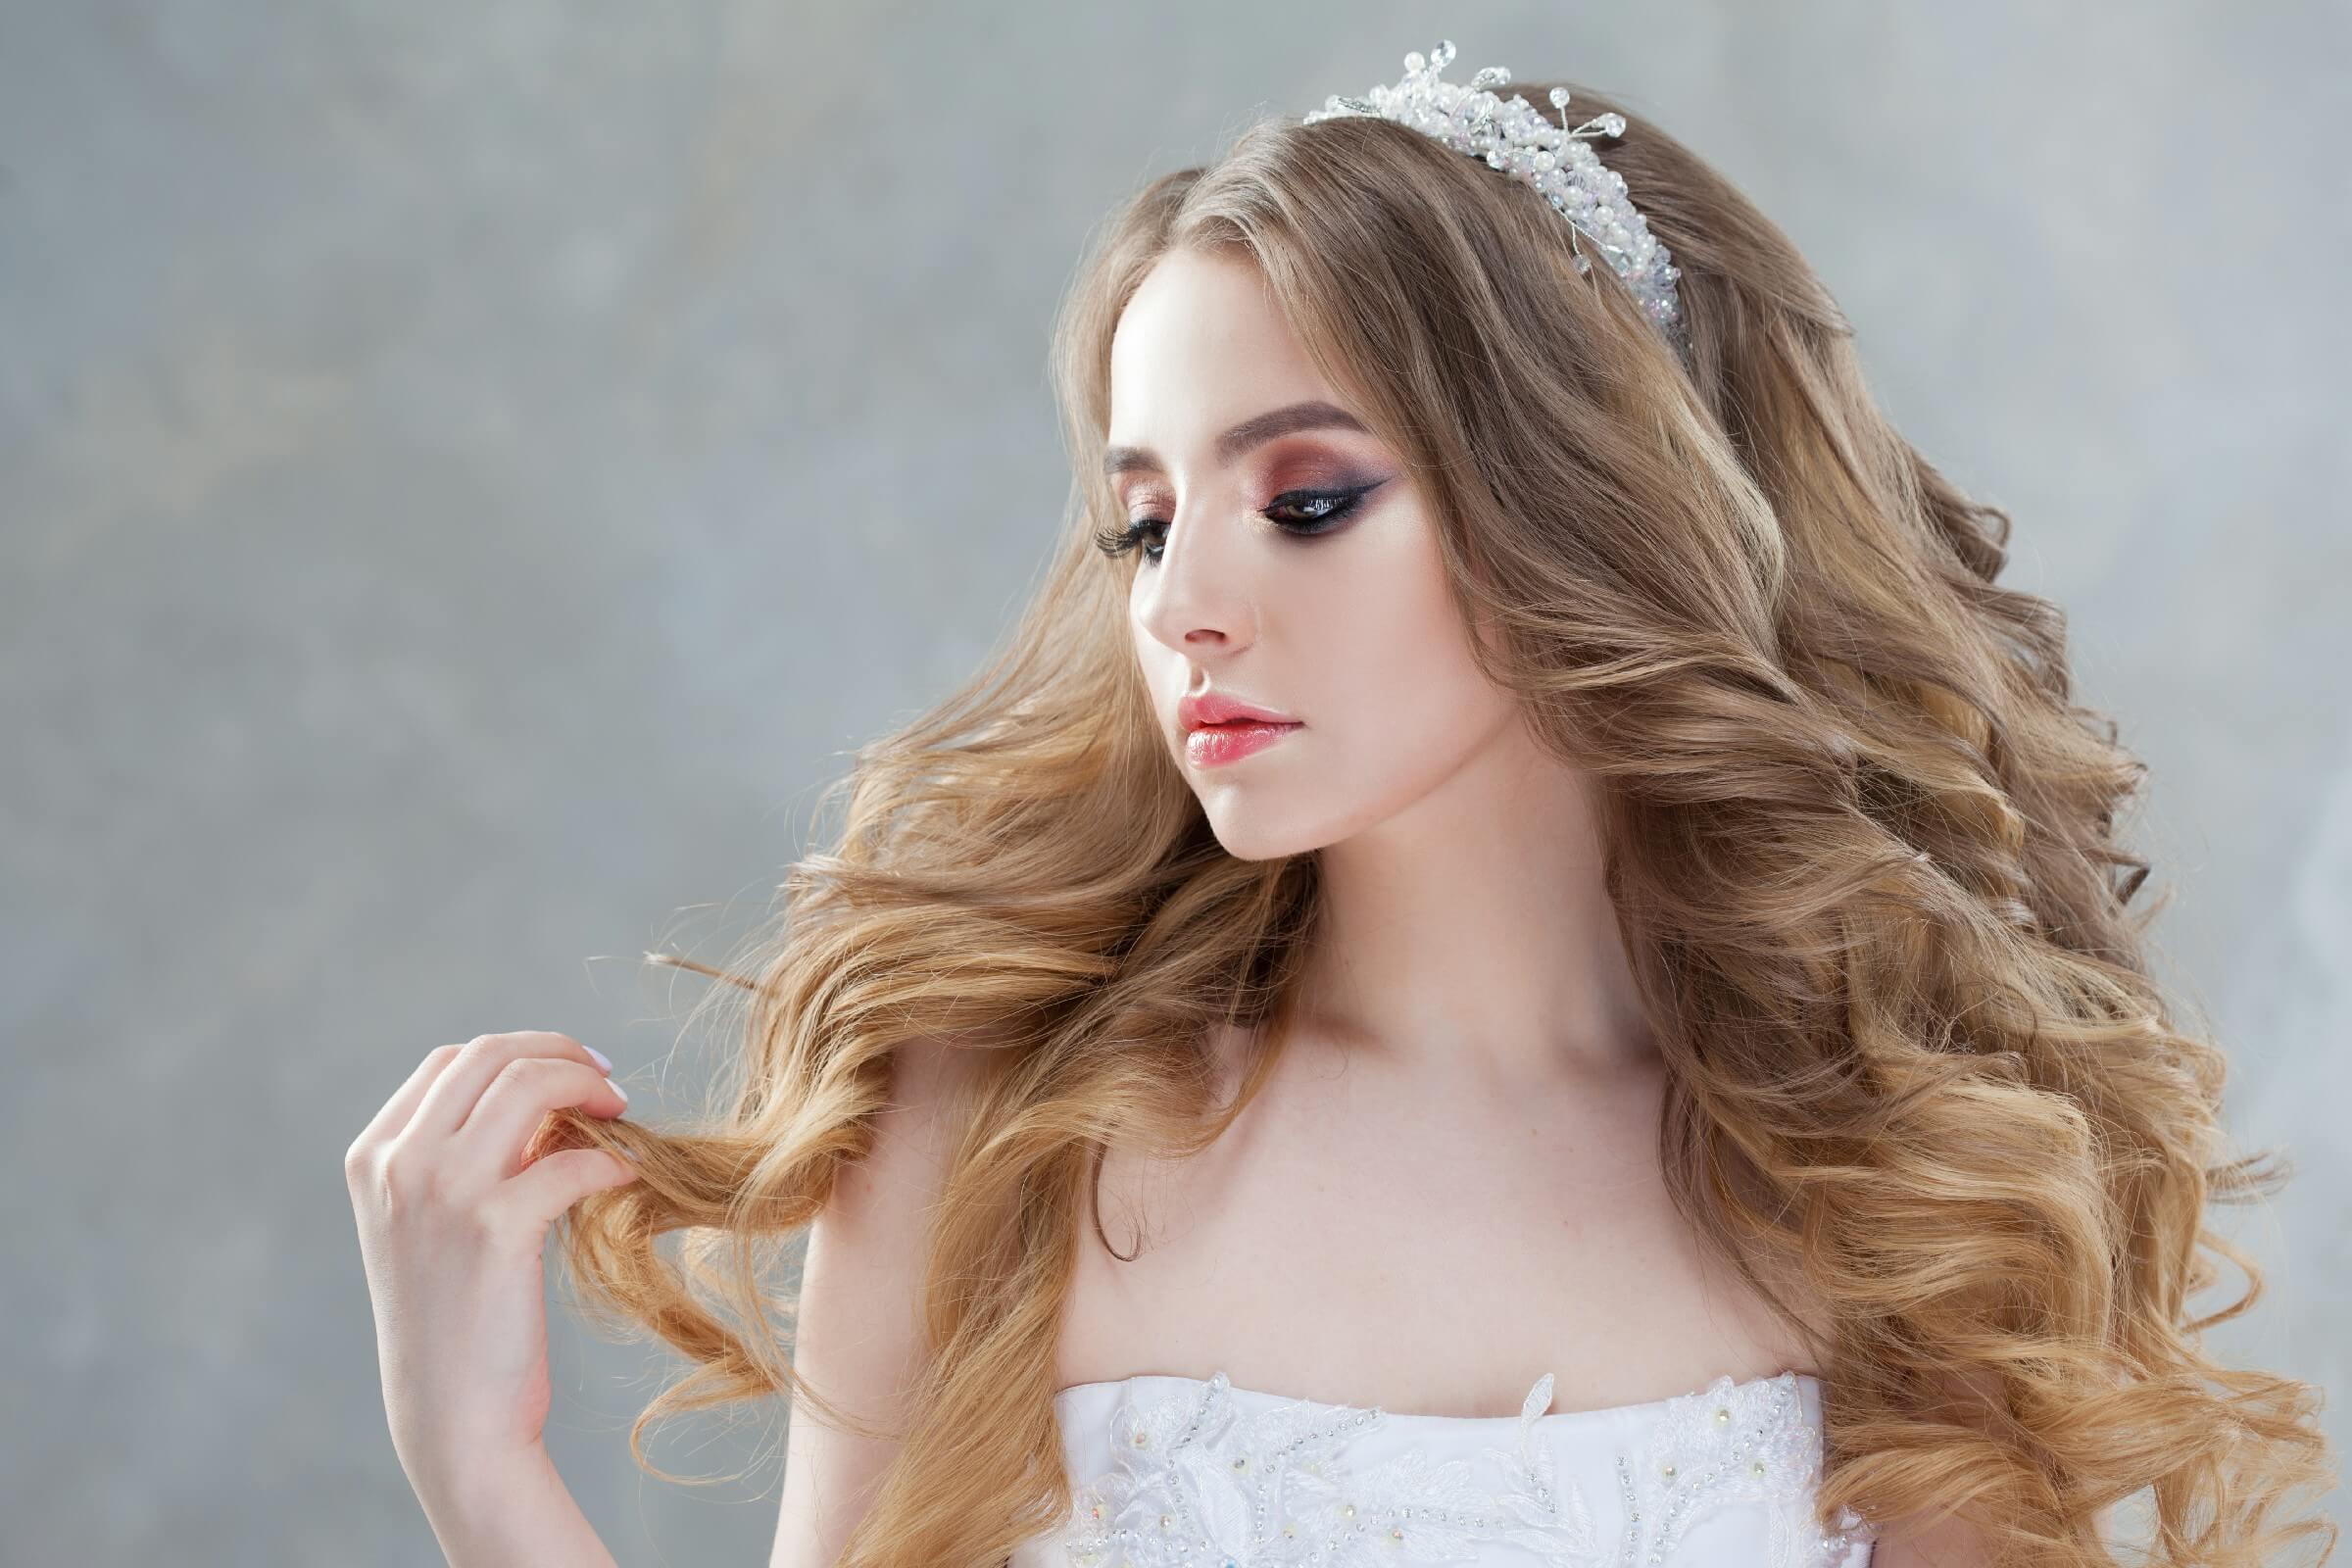 Dramatic-Eye Natural Wedding Makeup Look